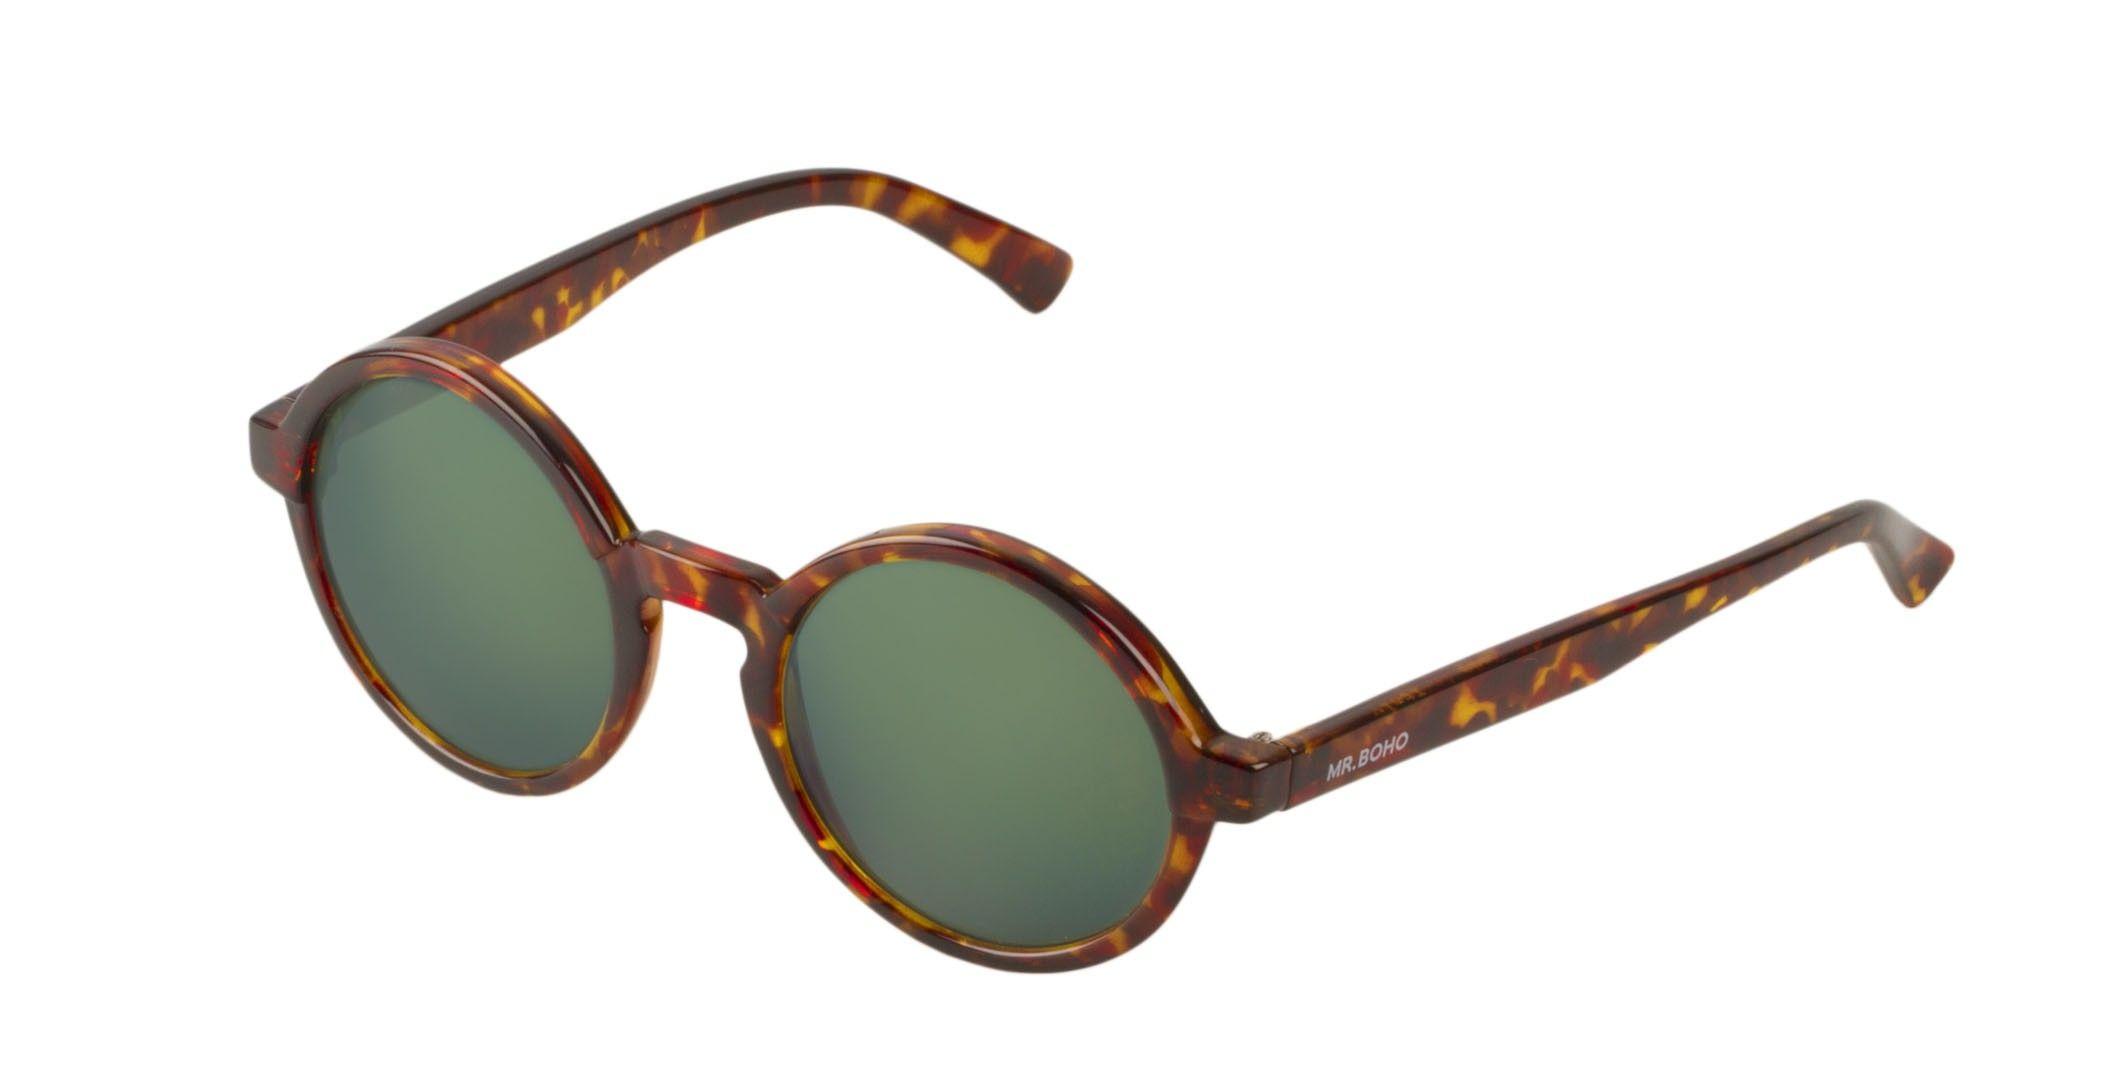 MrBoho Cheetah Tortoise Dalston with dark green lenses